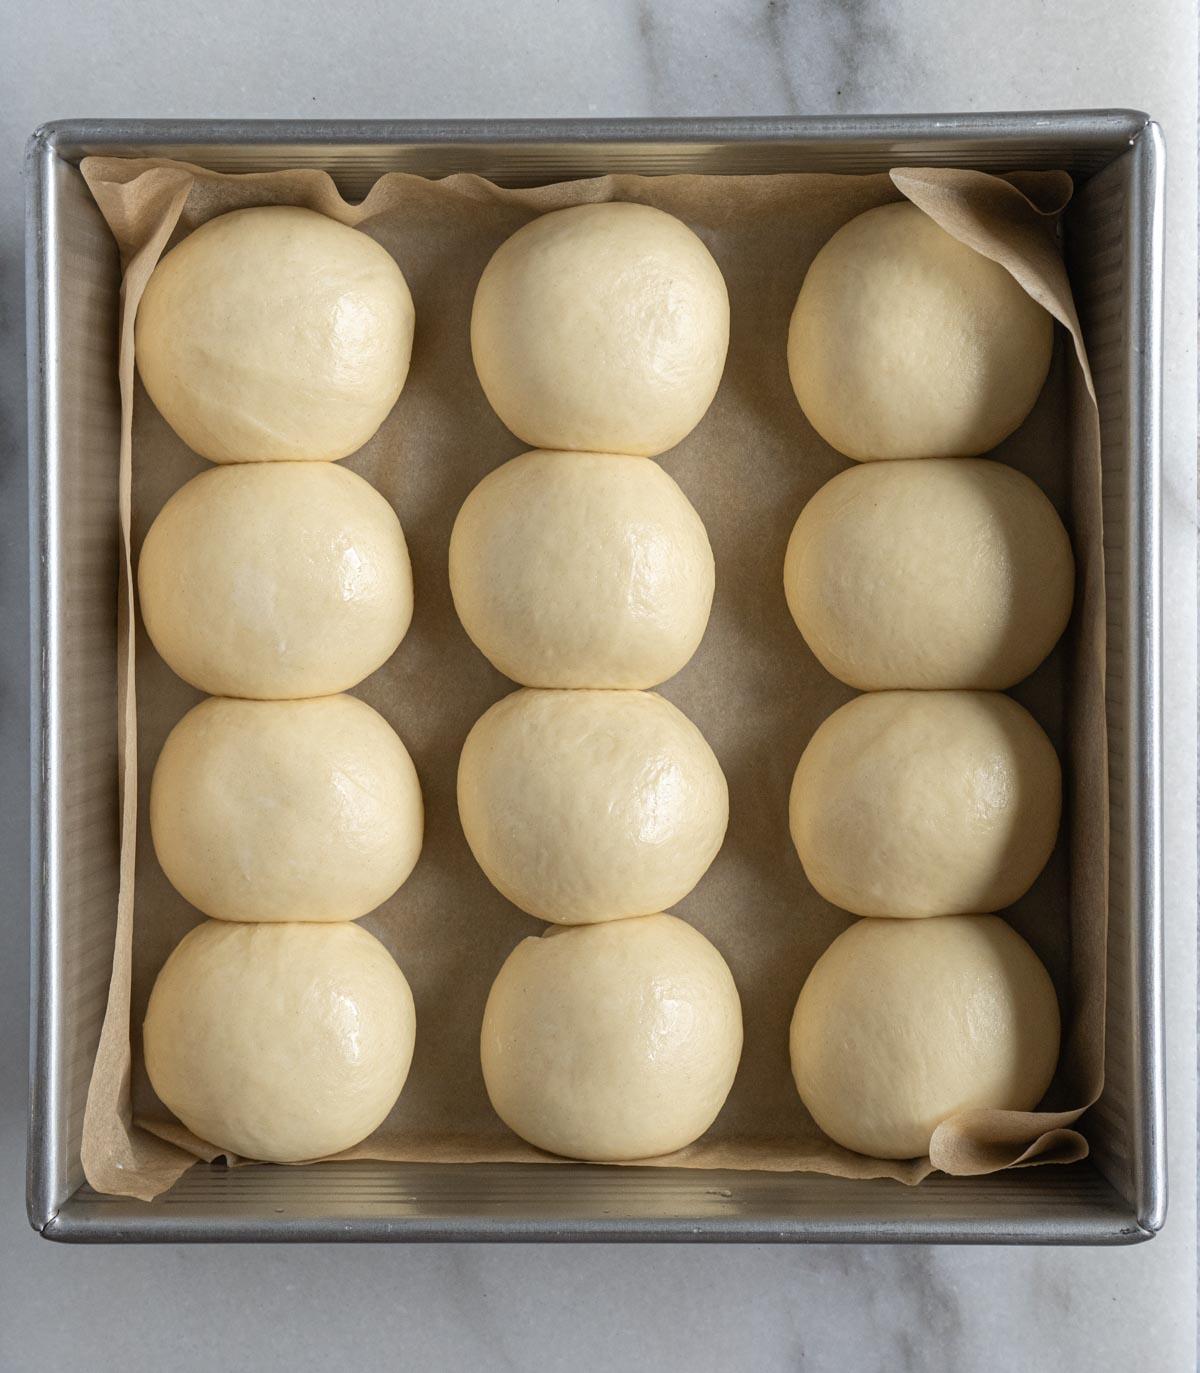 milk bun dough after second proof.